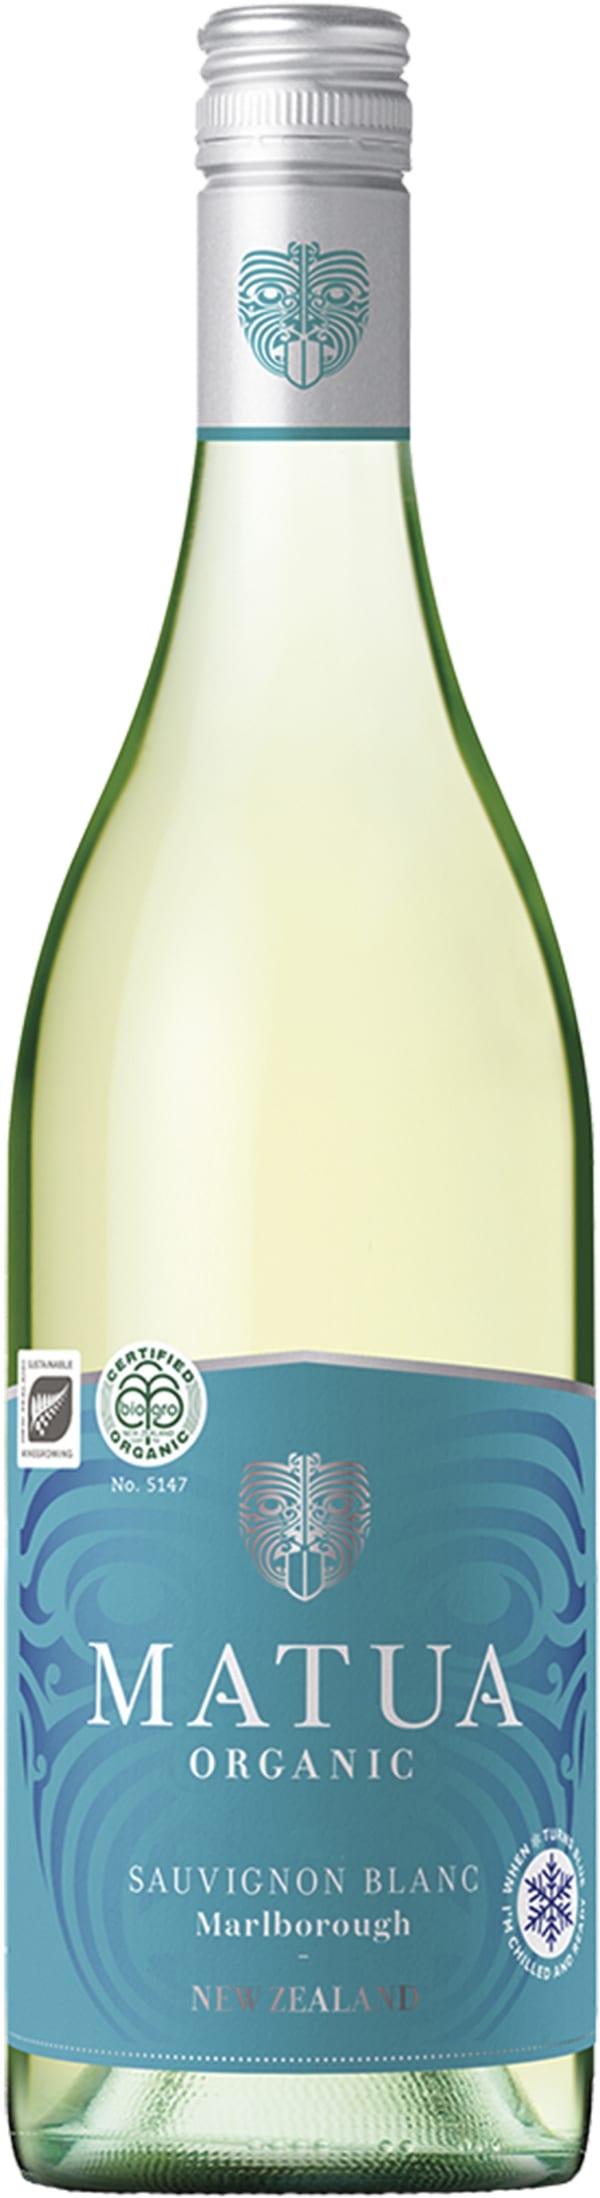 Matua Marlborough Organic Sauvignon Blanc 2020